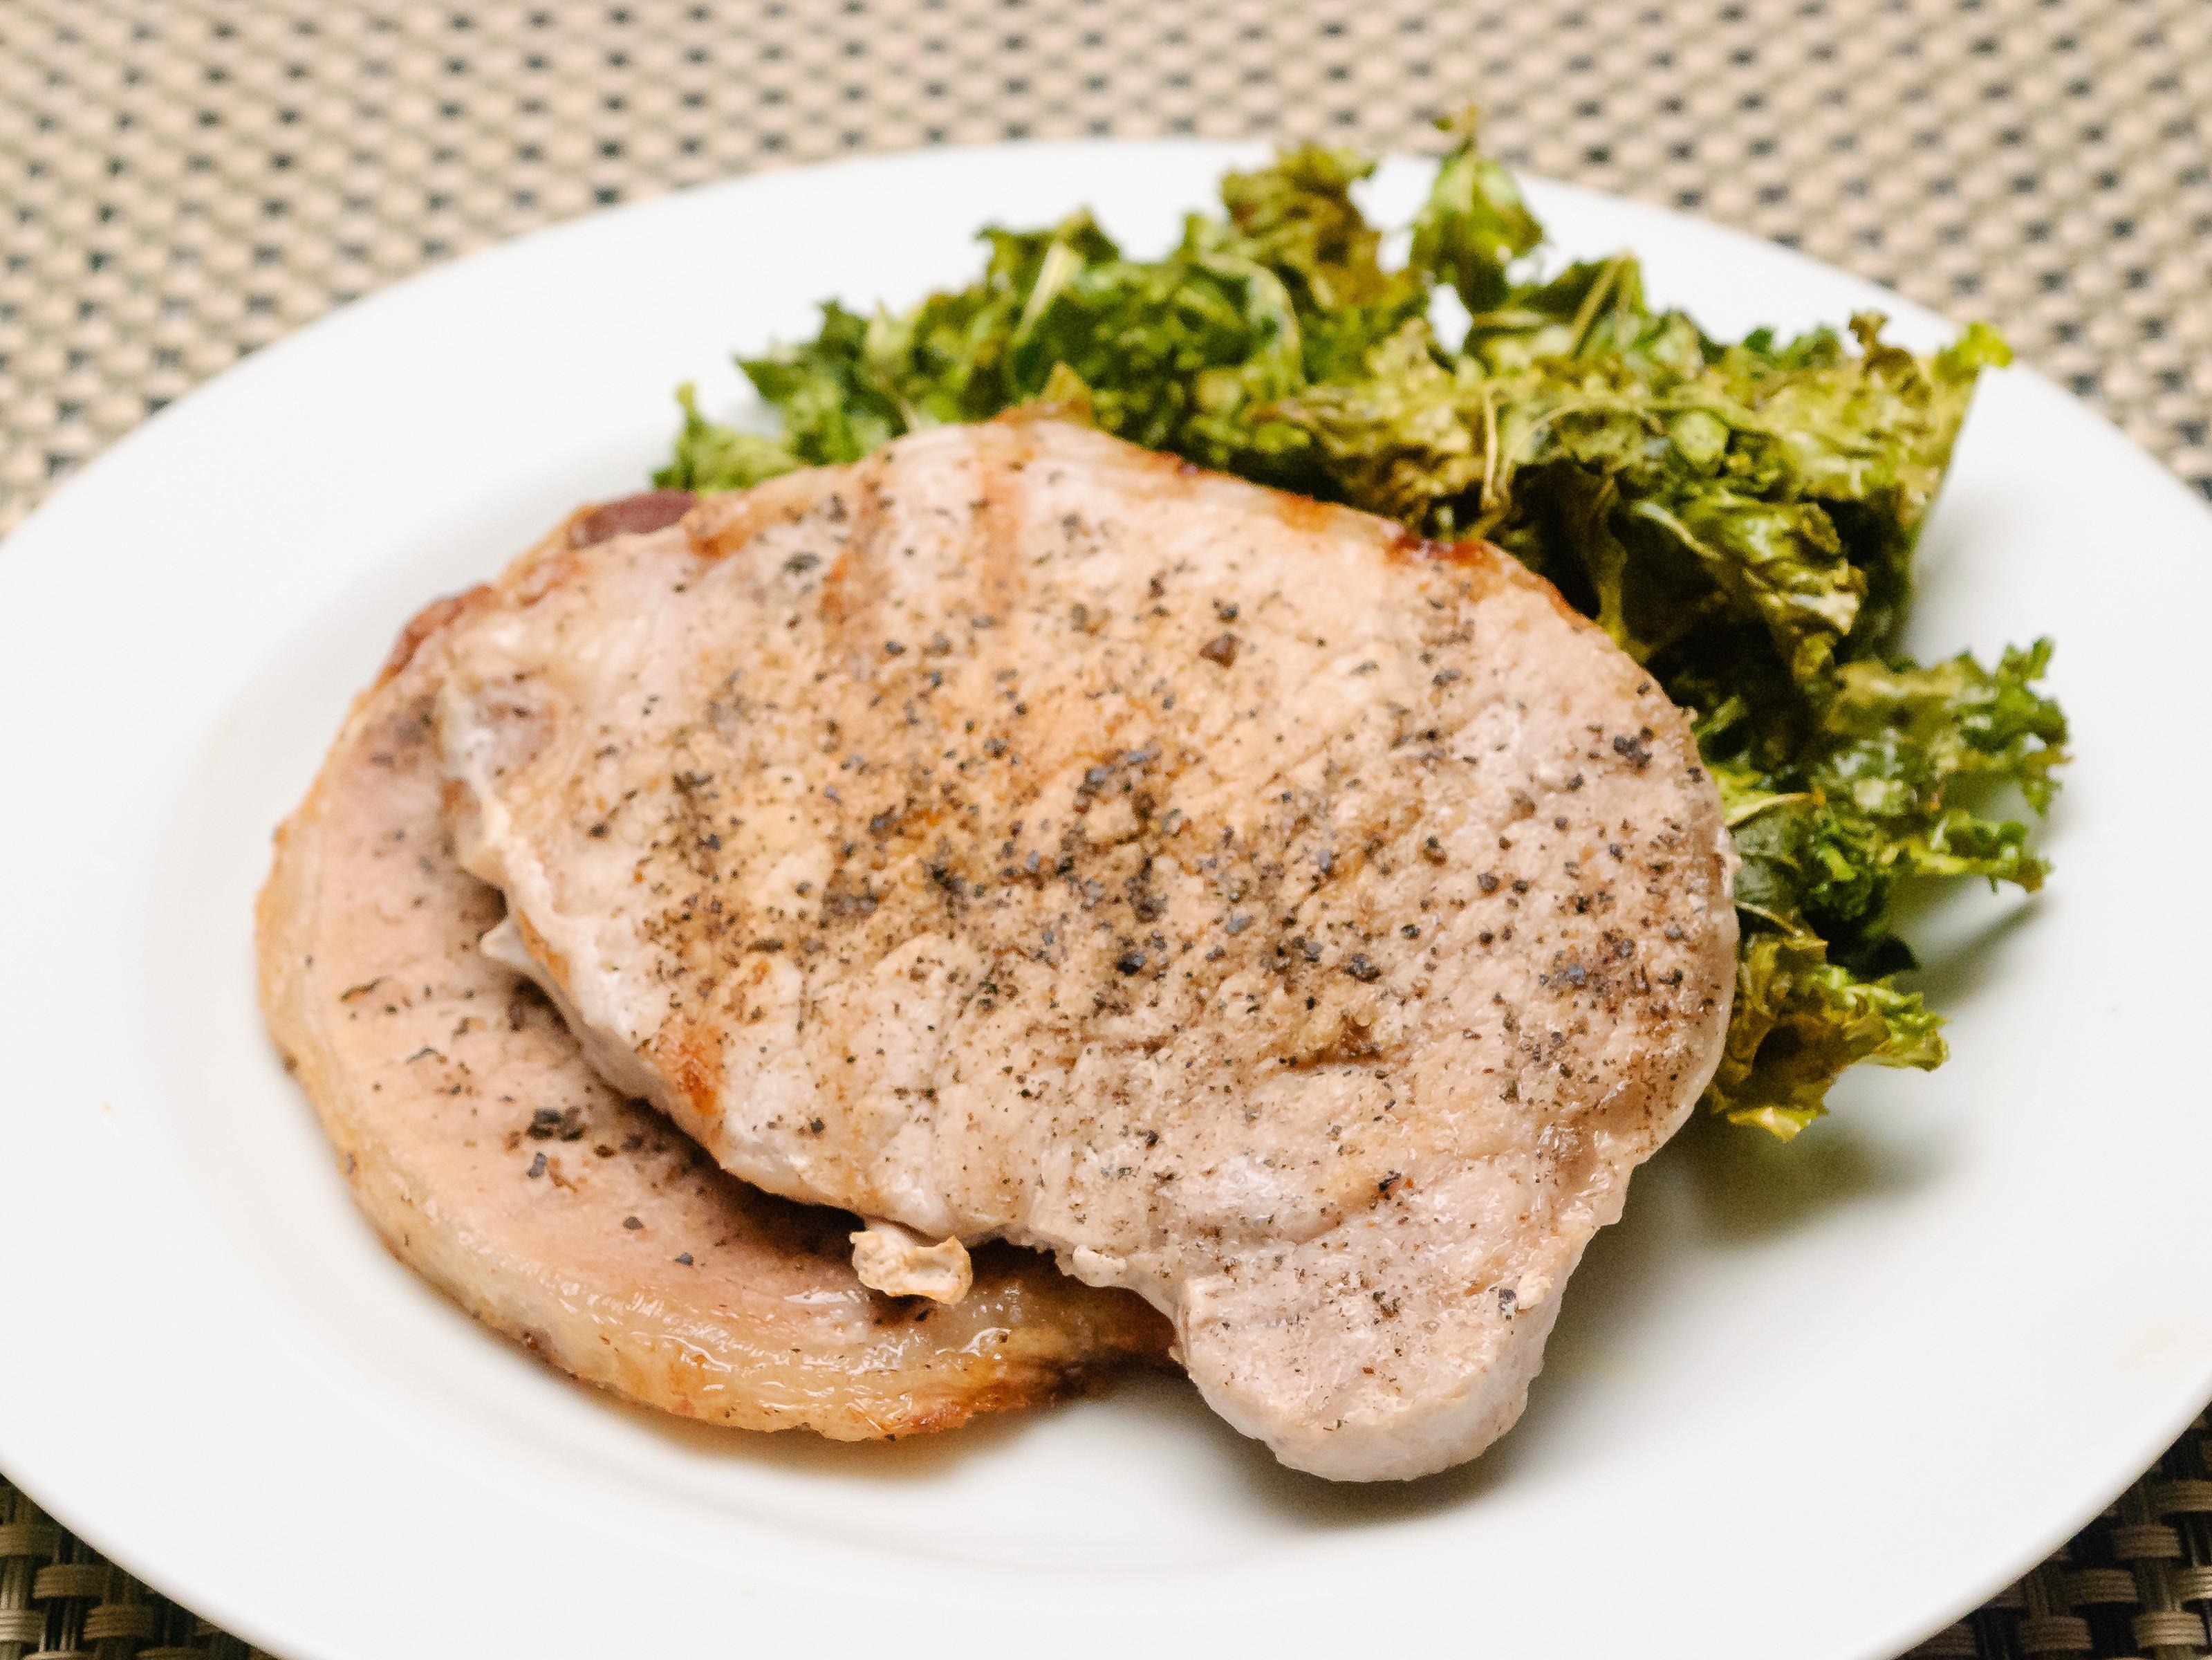 Ways To Cook Pork Loin  4 Ways to Cook Pork Loin Steaks wikiHow